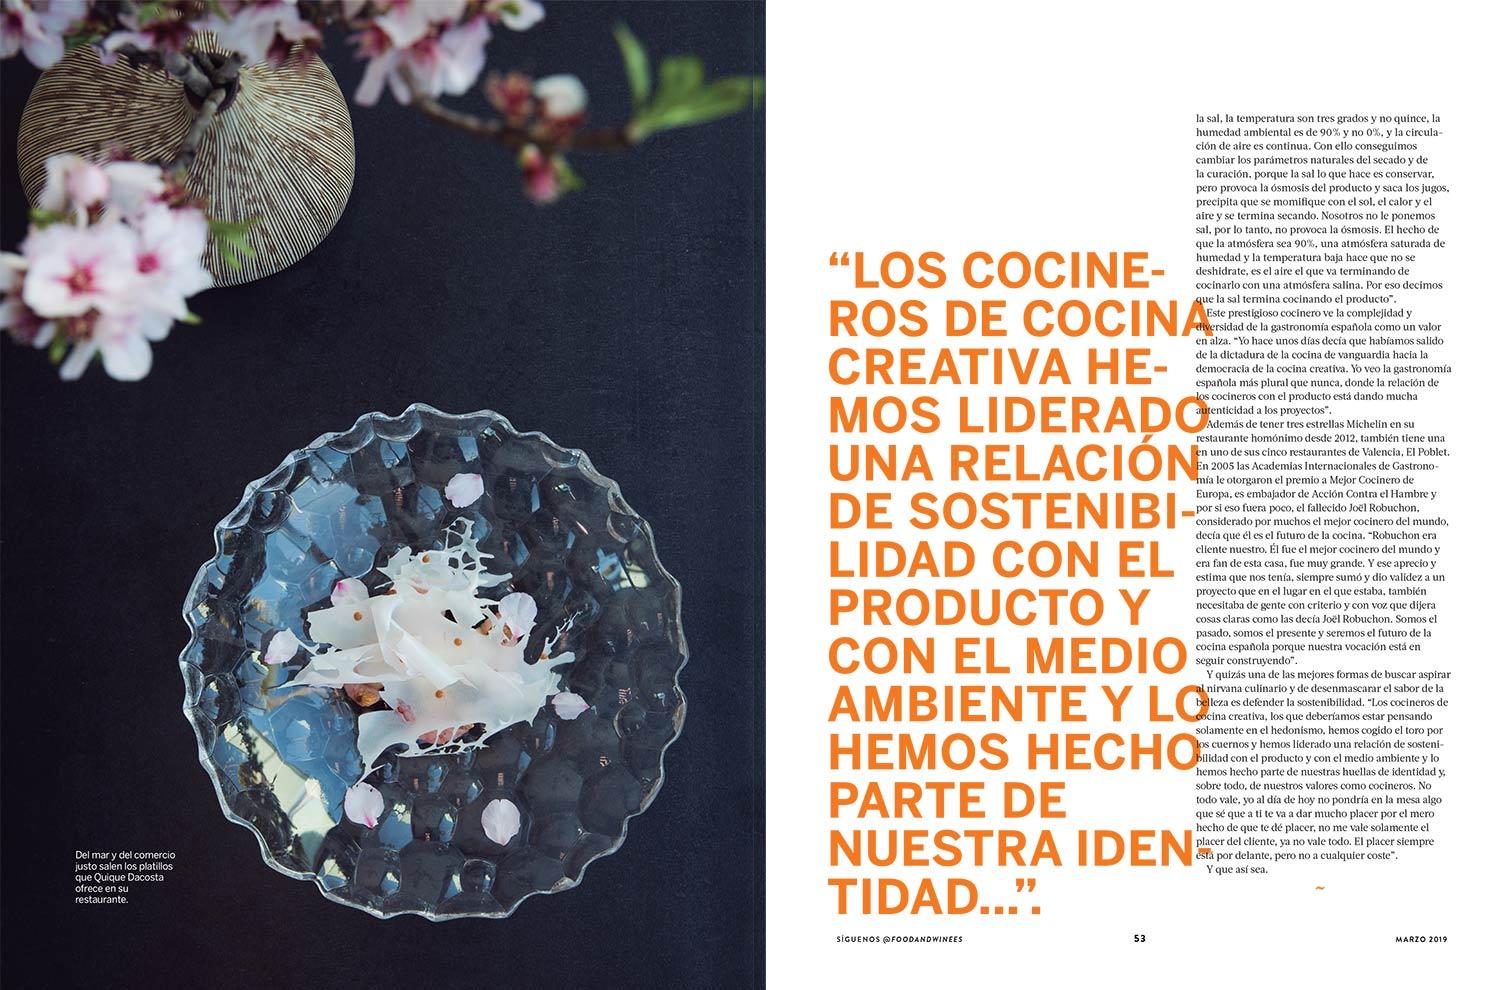 quique-dacosta-foodandwine-04.jpg